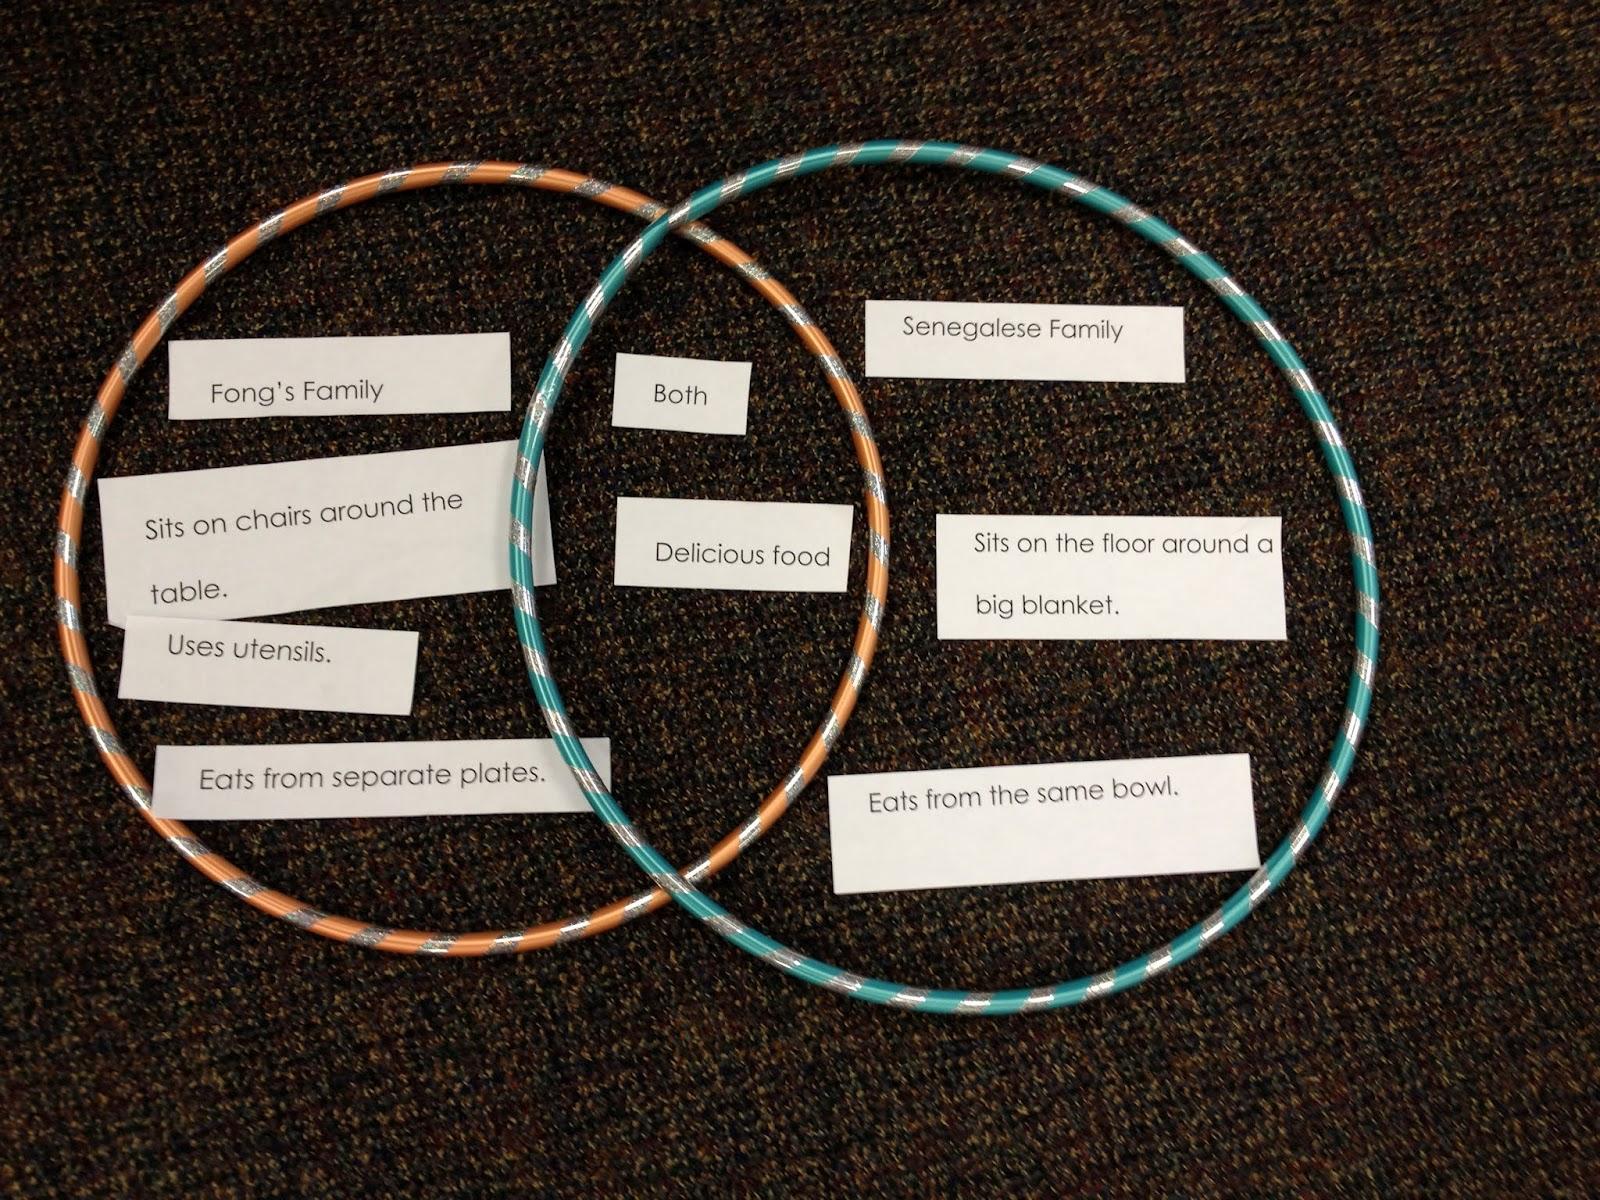 miss ritchey u0026 39 s classroom ideas  student teaching classroom ideas